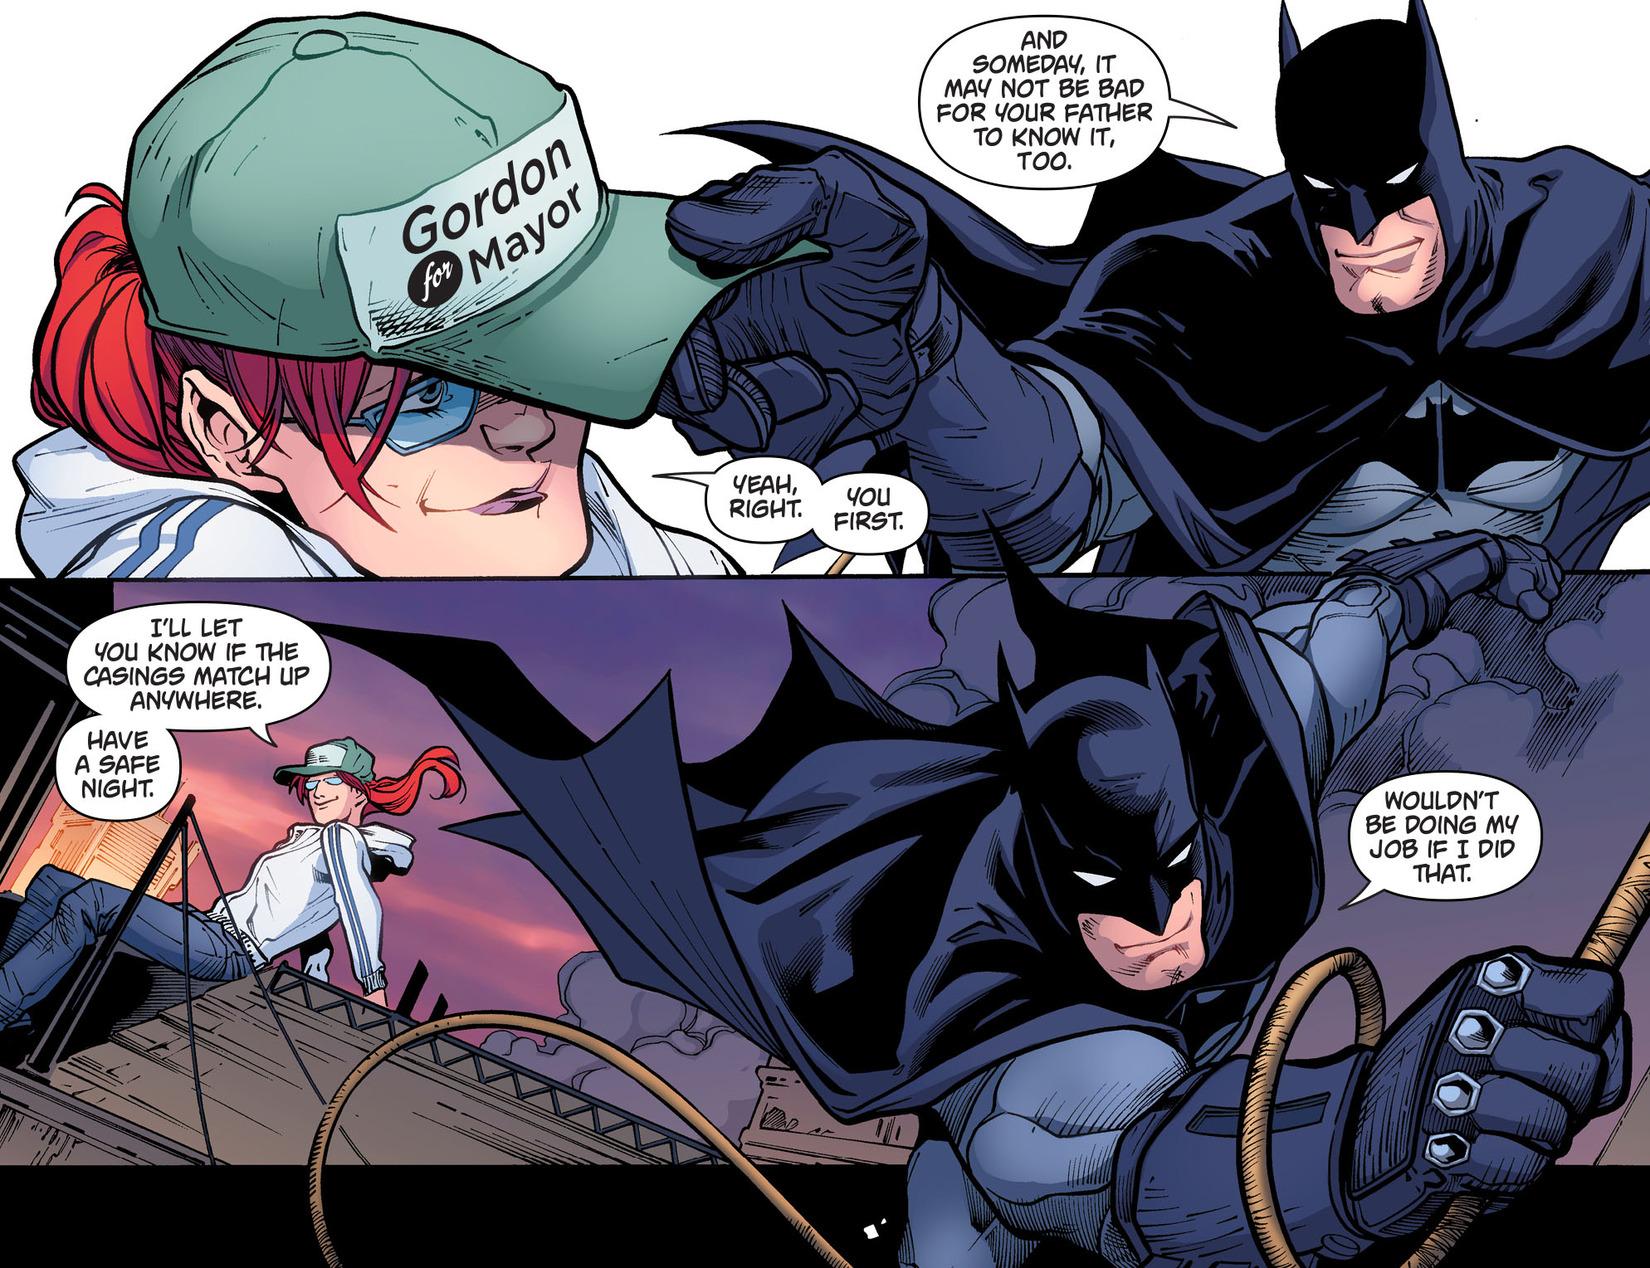 Batman: Arkham Knight [I] chap 39 pic 18